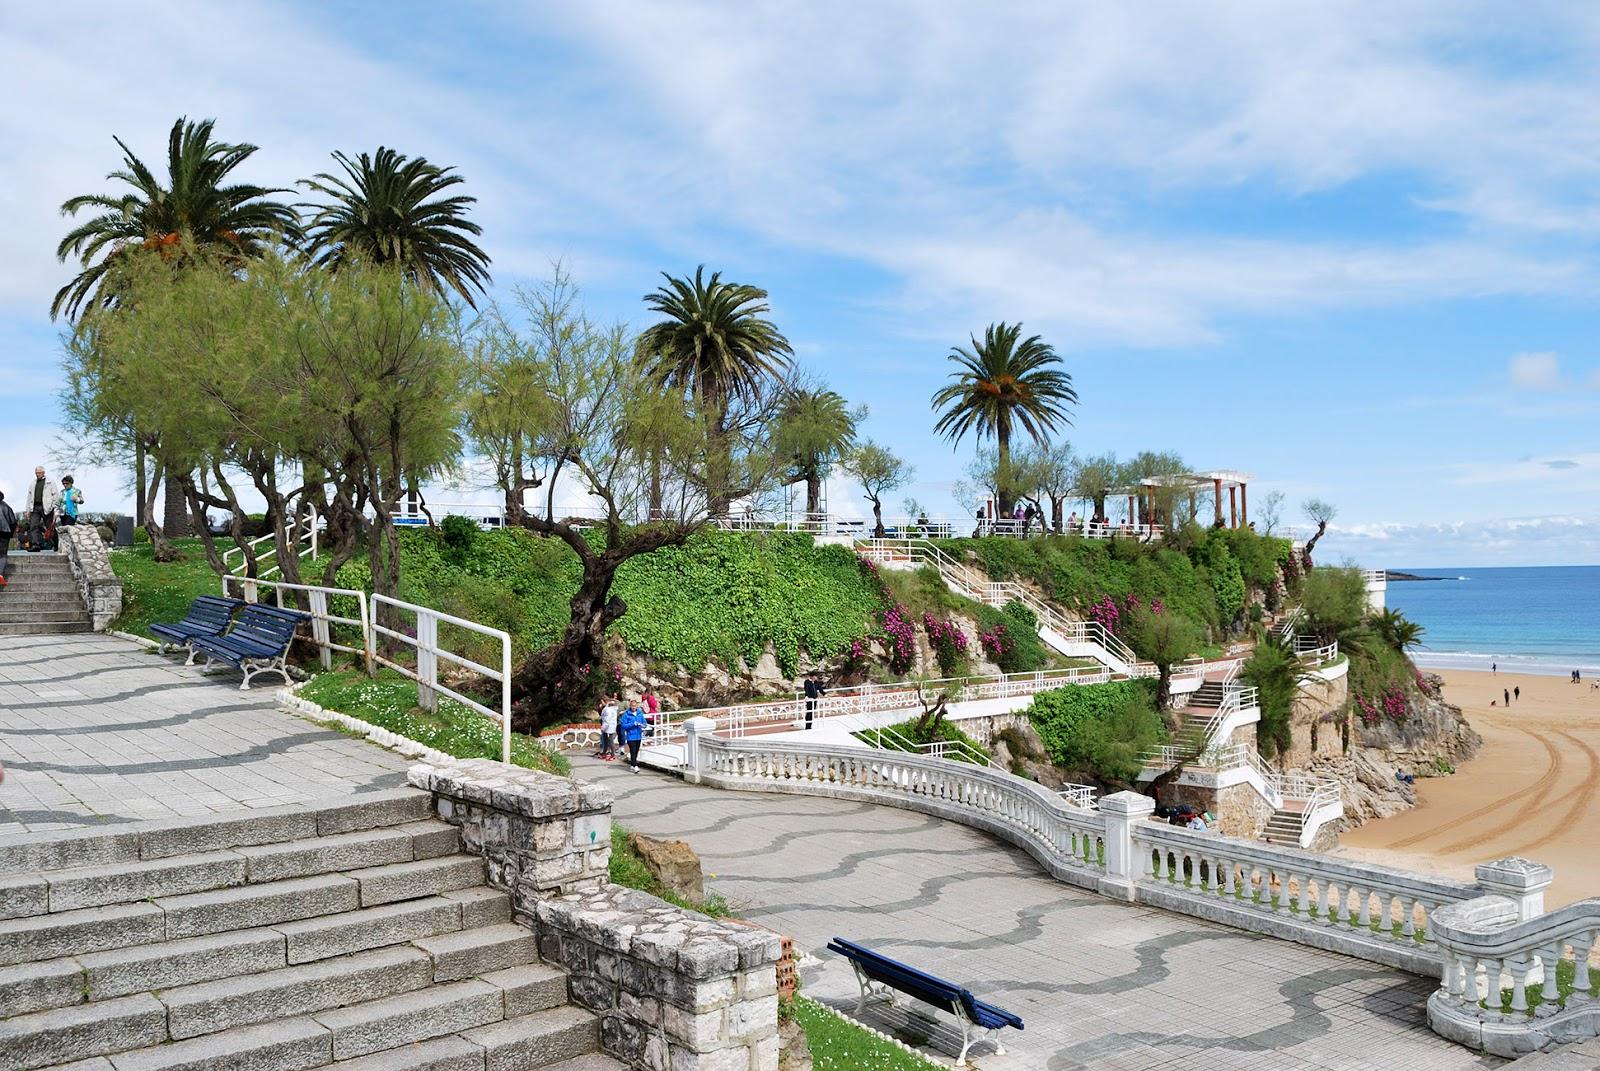 jardines piquio playa sardinero santander cantabria